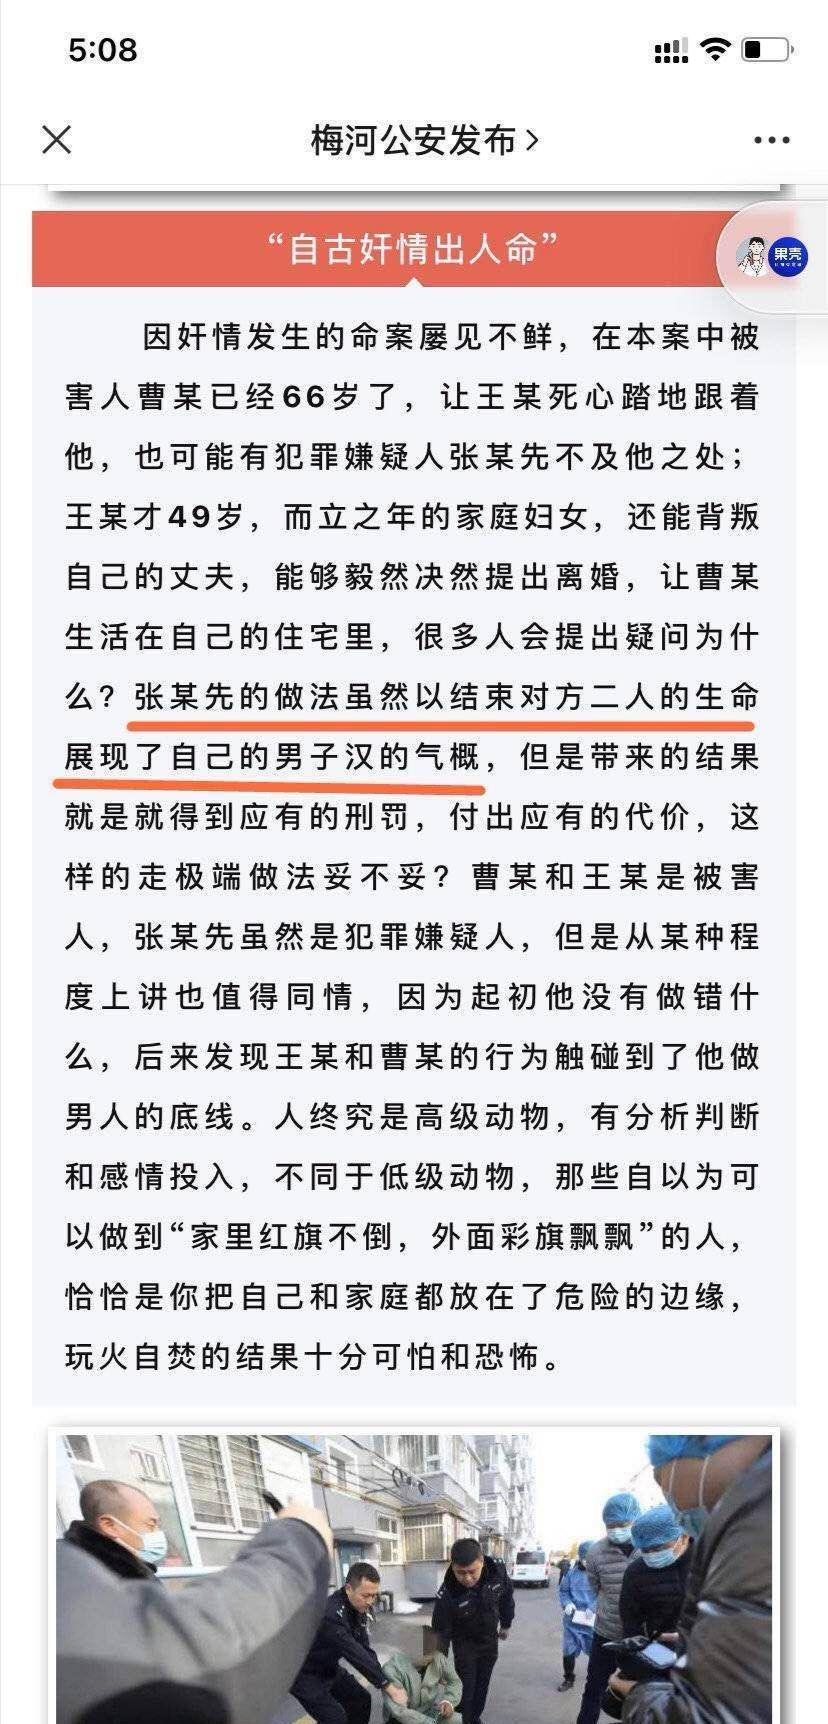 "【coinbase】_案件通报称""自古奸情出人命""""嫌犯值得同情"",吉林梅河口警方回应"